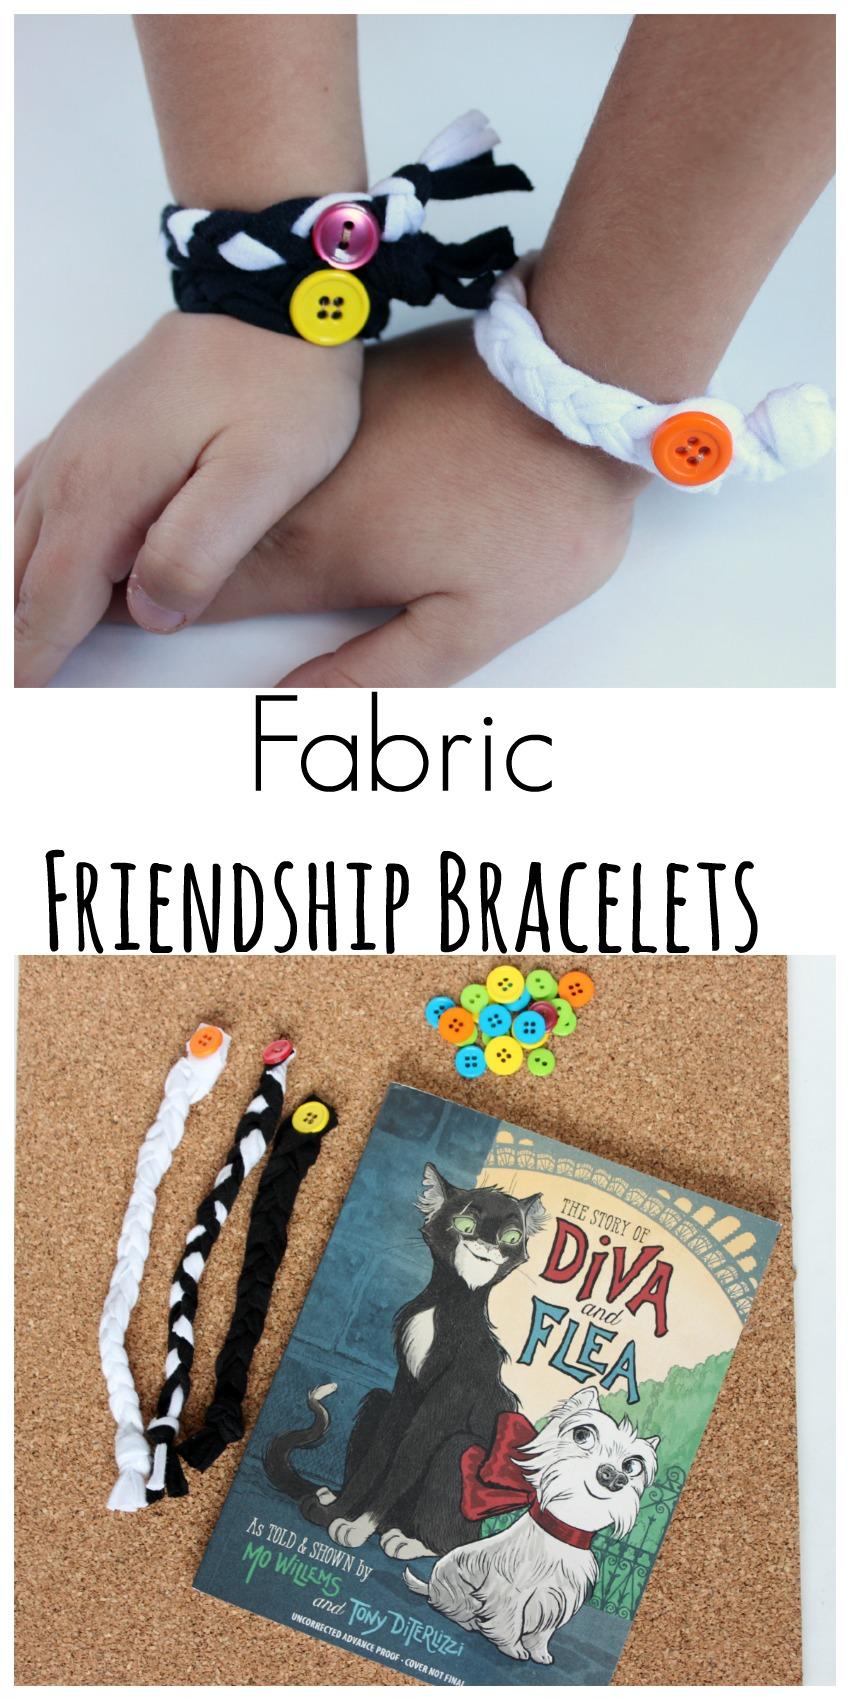 Fabric Friendship Bracelets Craft for Kids